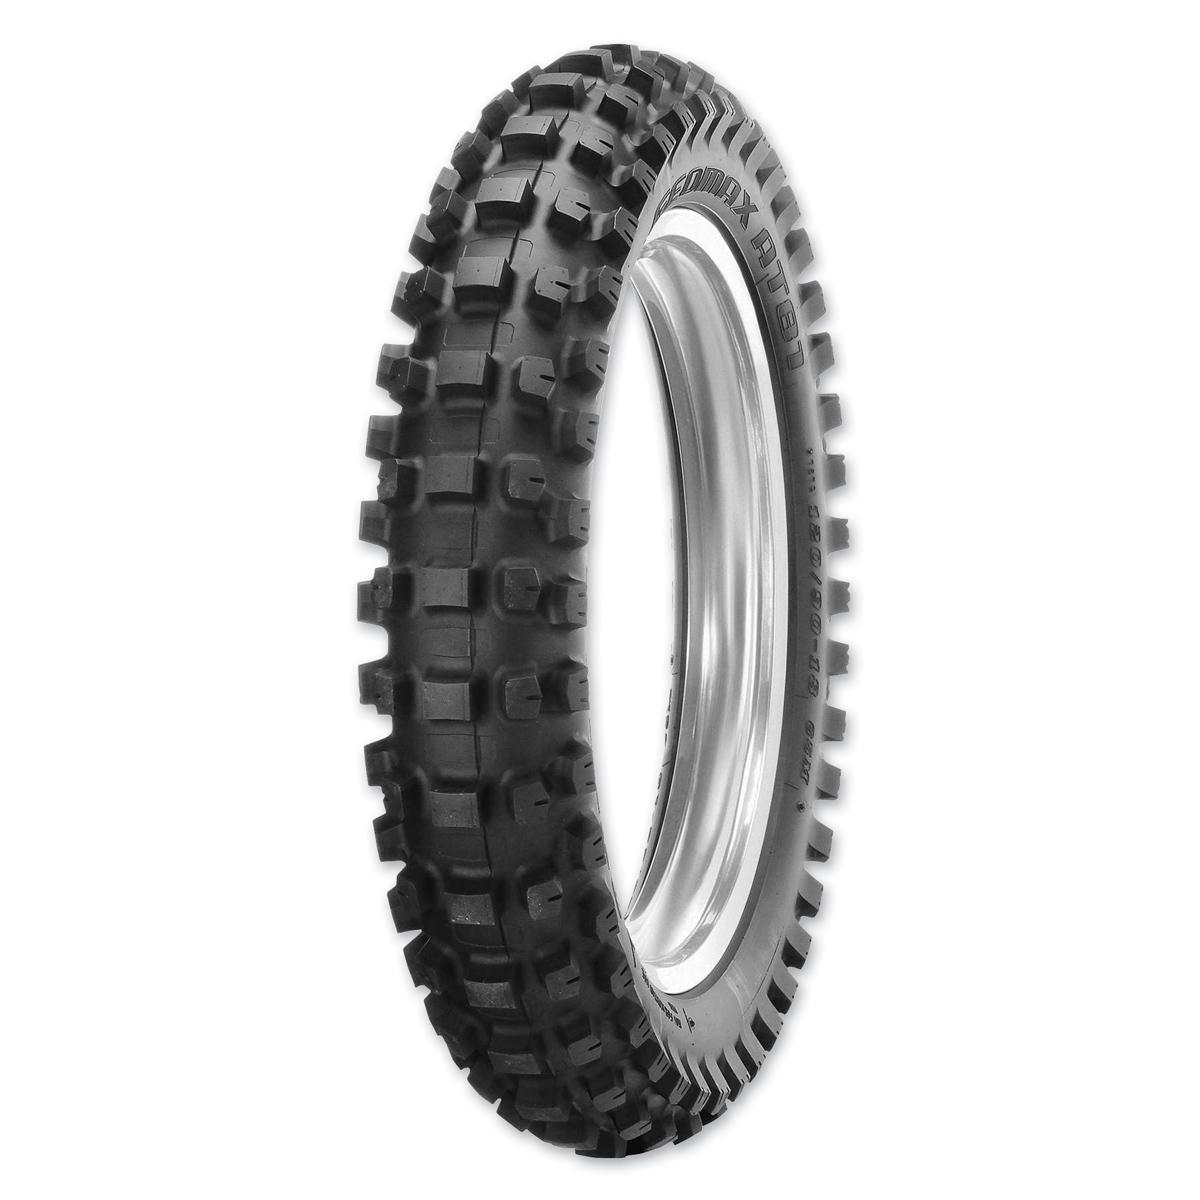 Dunlop Geomax AT81 120/90-18 Rear Tire